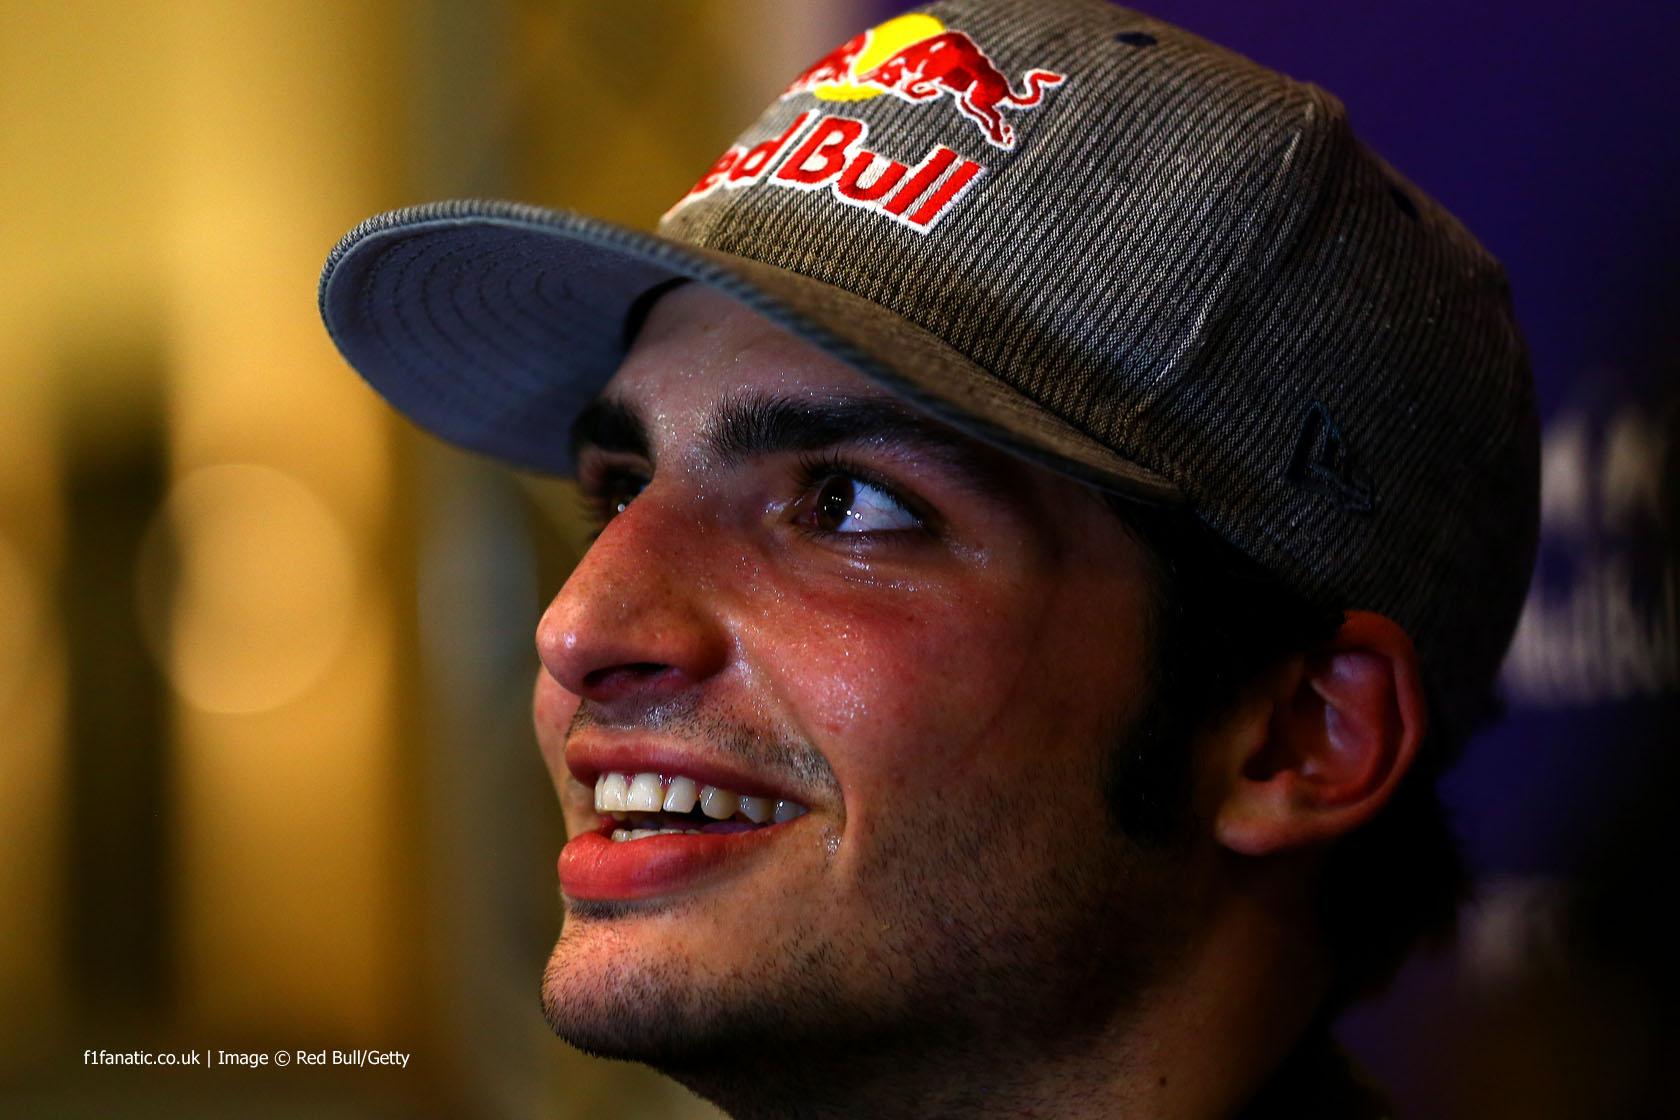 Carlos Sainz Jnr, Red Bull, Yas Marina, 2014